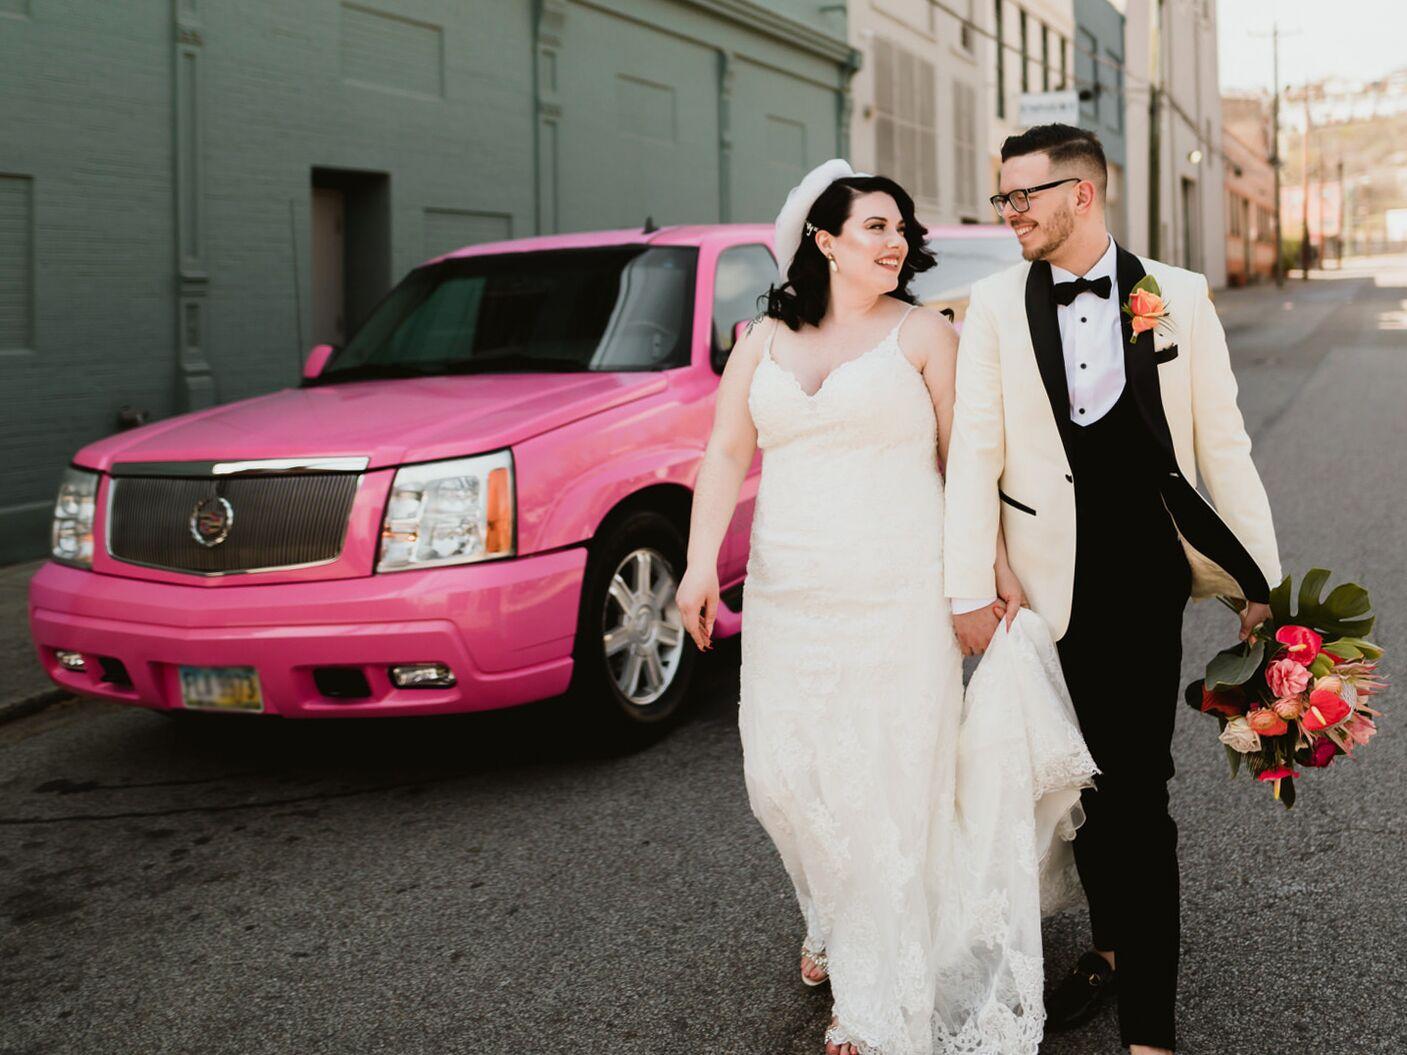 59e0e2c899e Wedding Transportation Tips  Wedding Transportation Average Cost 2018